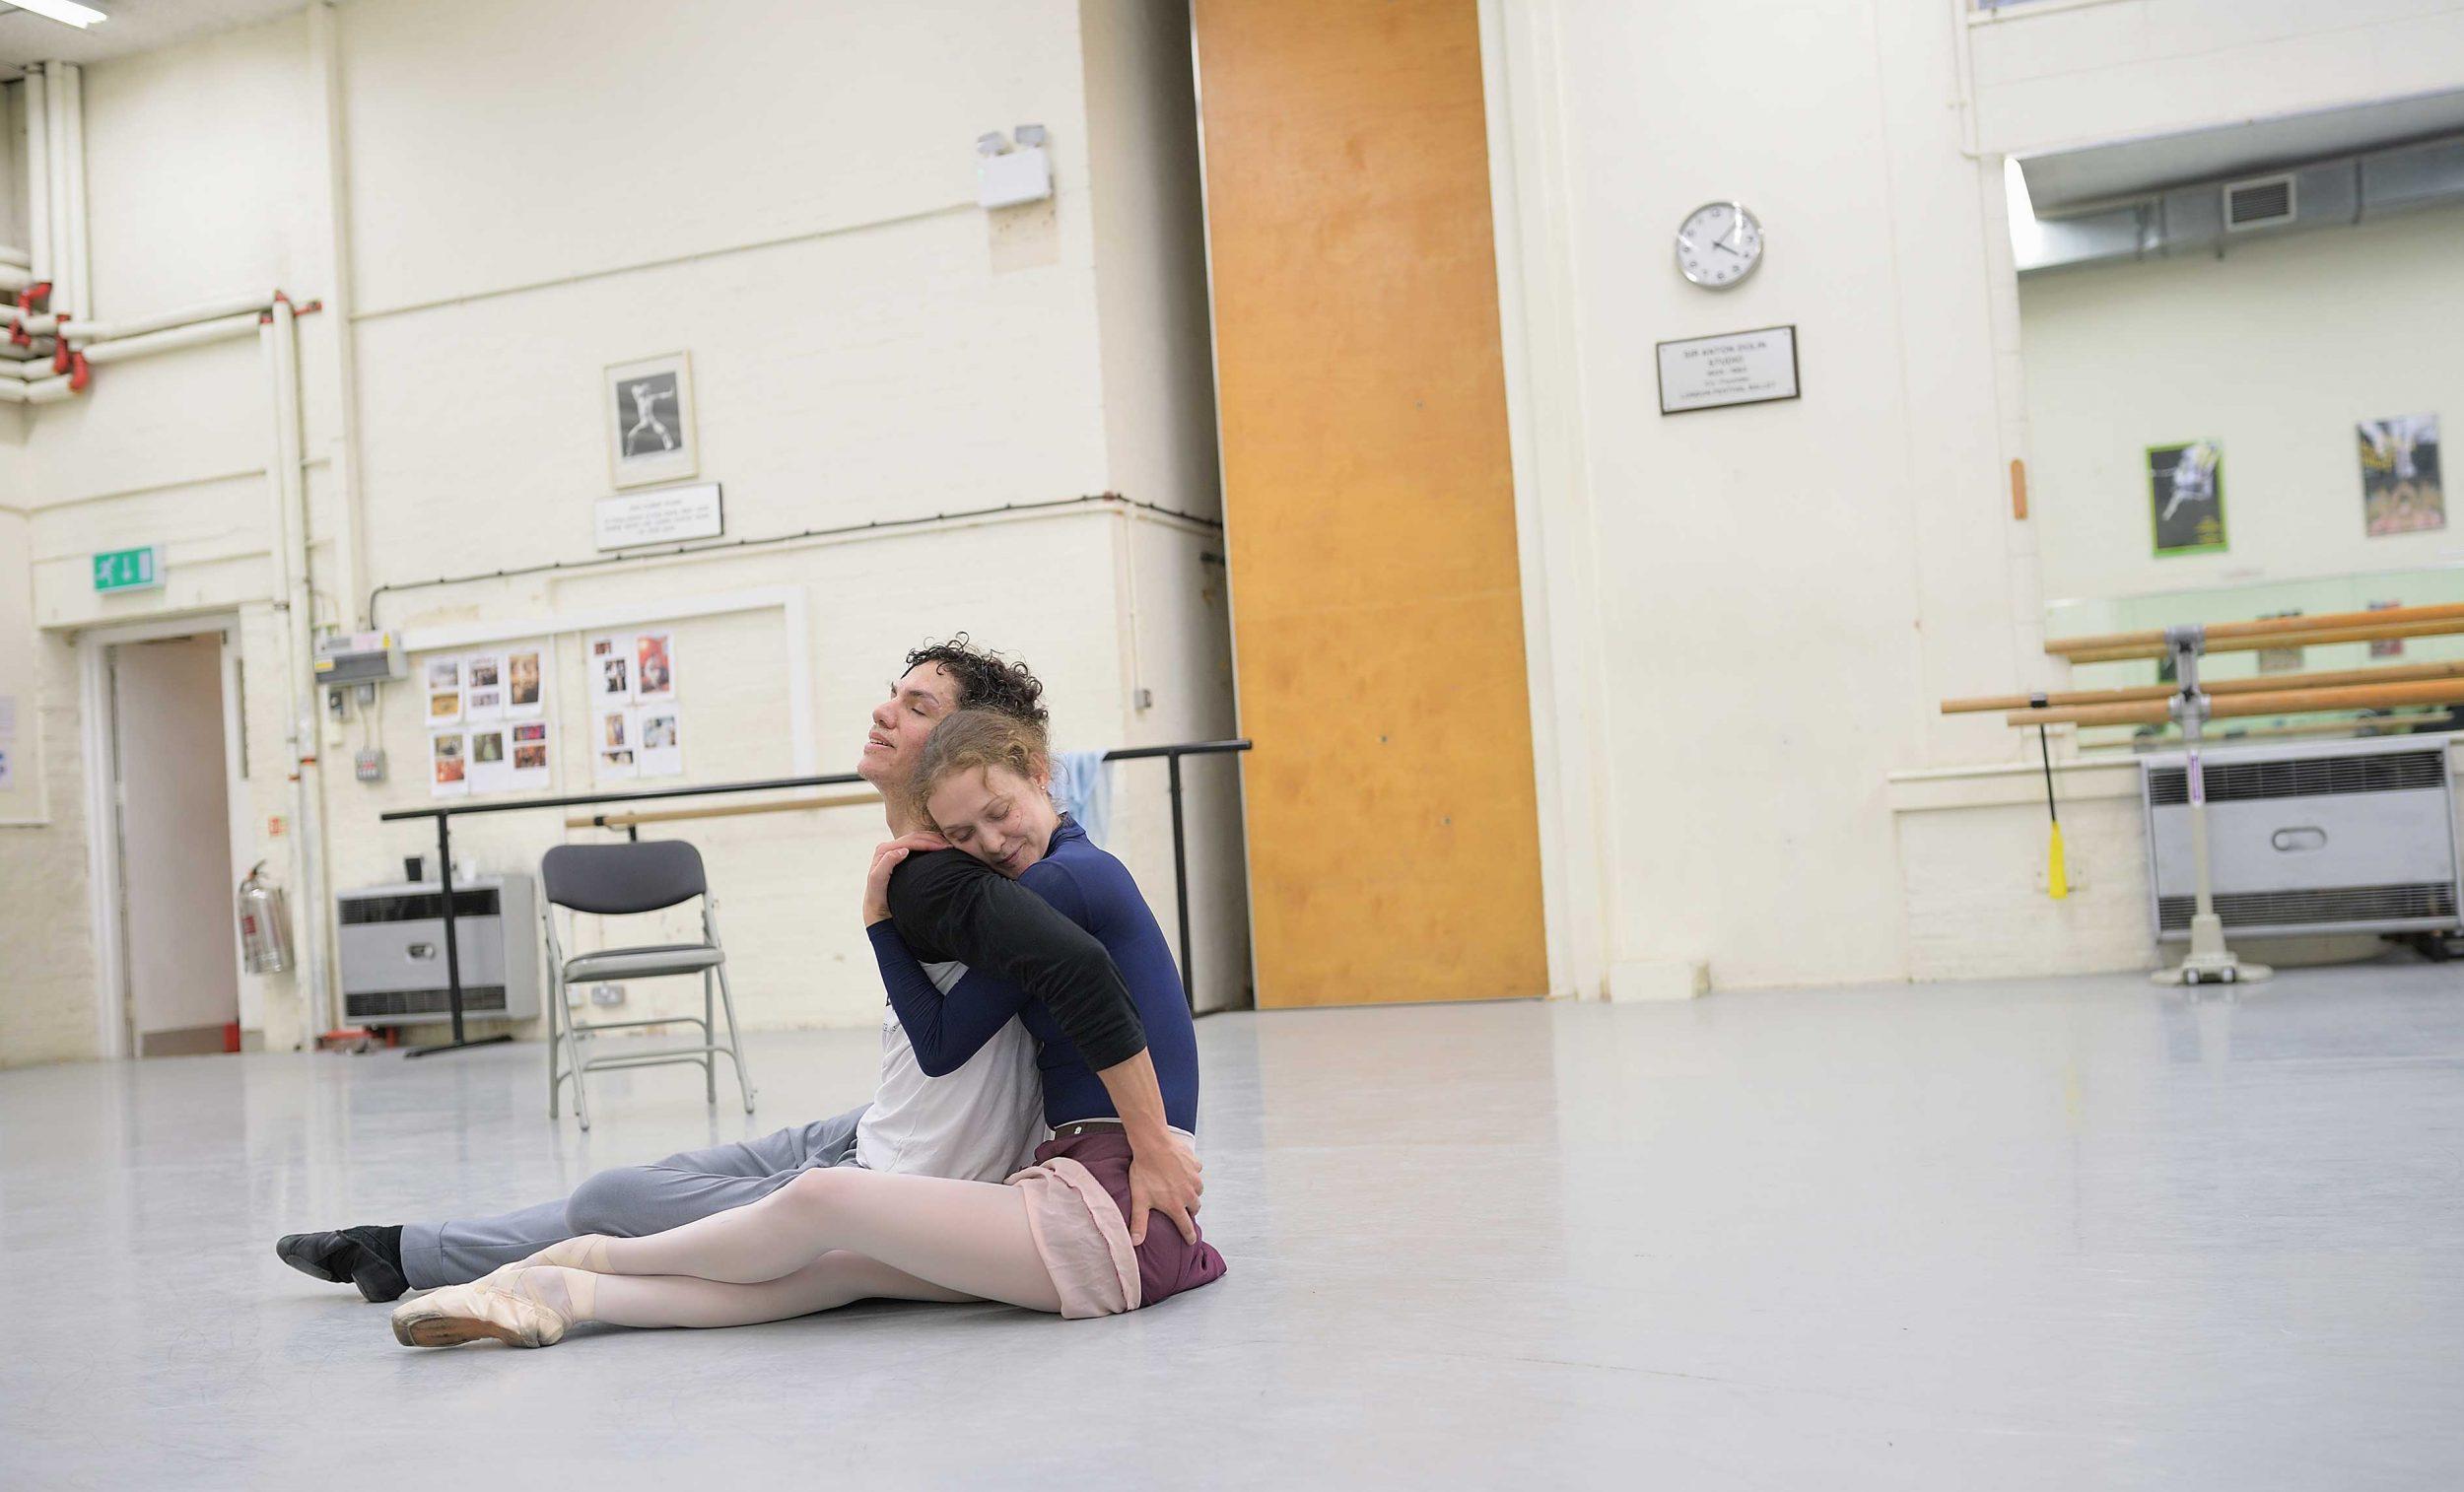 Isaac-Hernandez-and-Jurgita-Dronina-in-rehearsals-for-Manon-(c)-Laurent-Liotardo-(5)_WEB